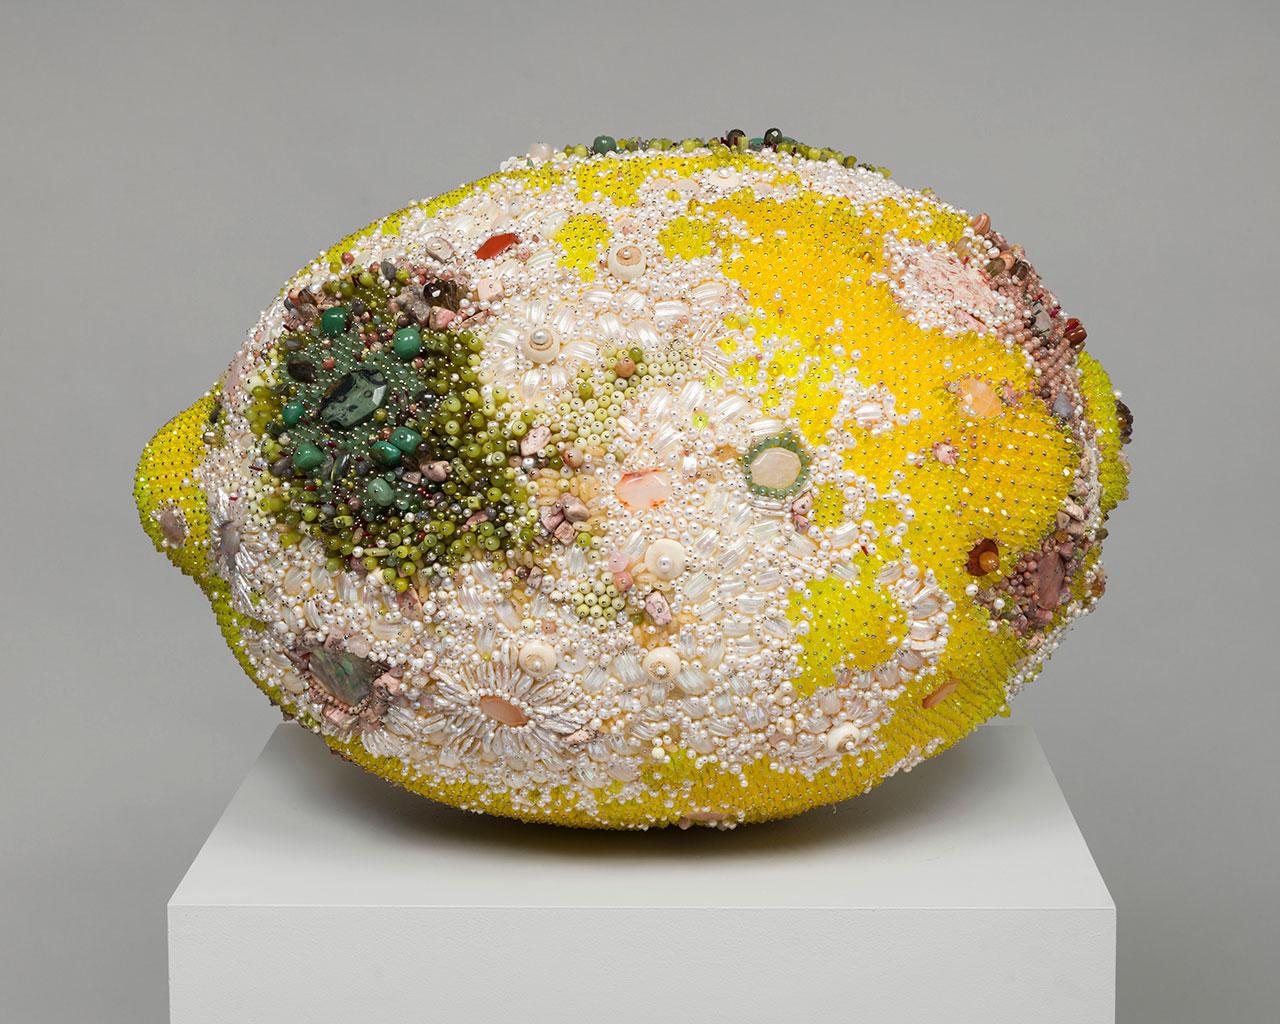 The Sculpture of Kathleen Ryan: Thousands of Gemstones + Decaying Fruit